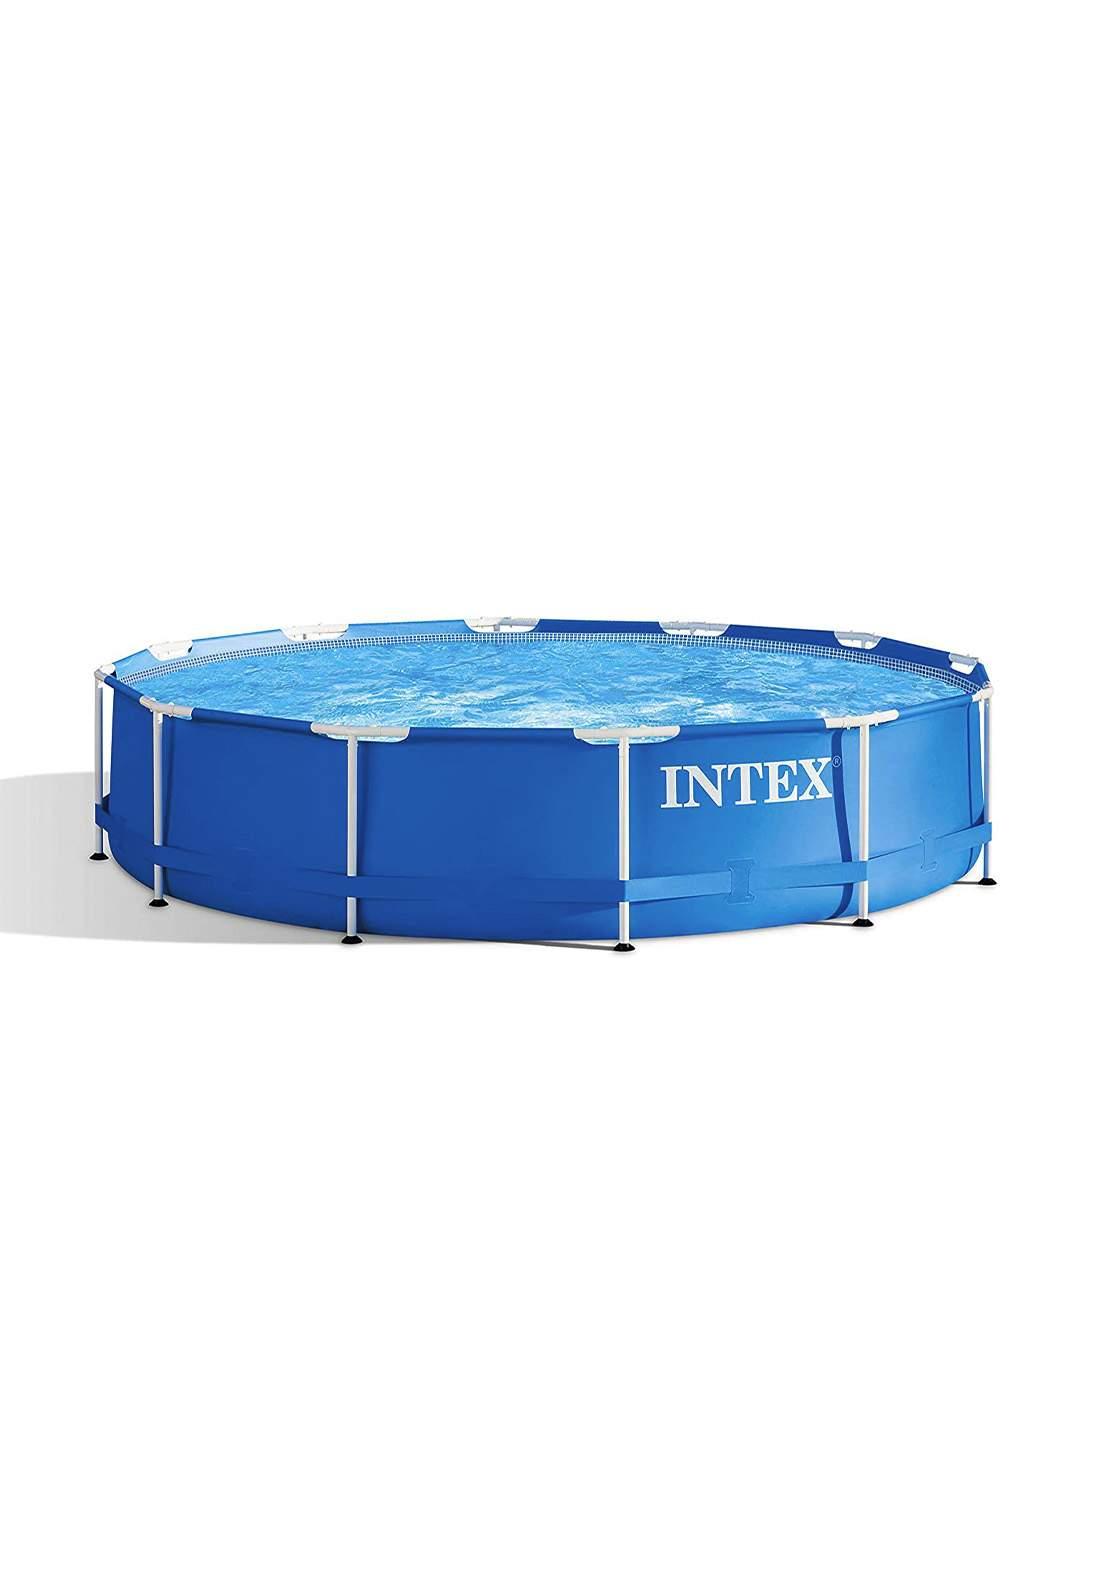 Intex 2821  Swimming Pool For Unisex مسبح